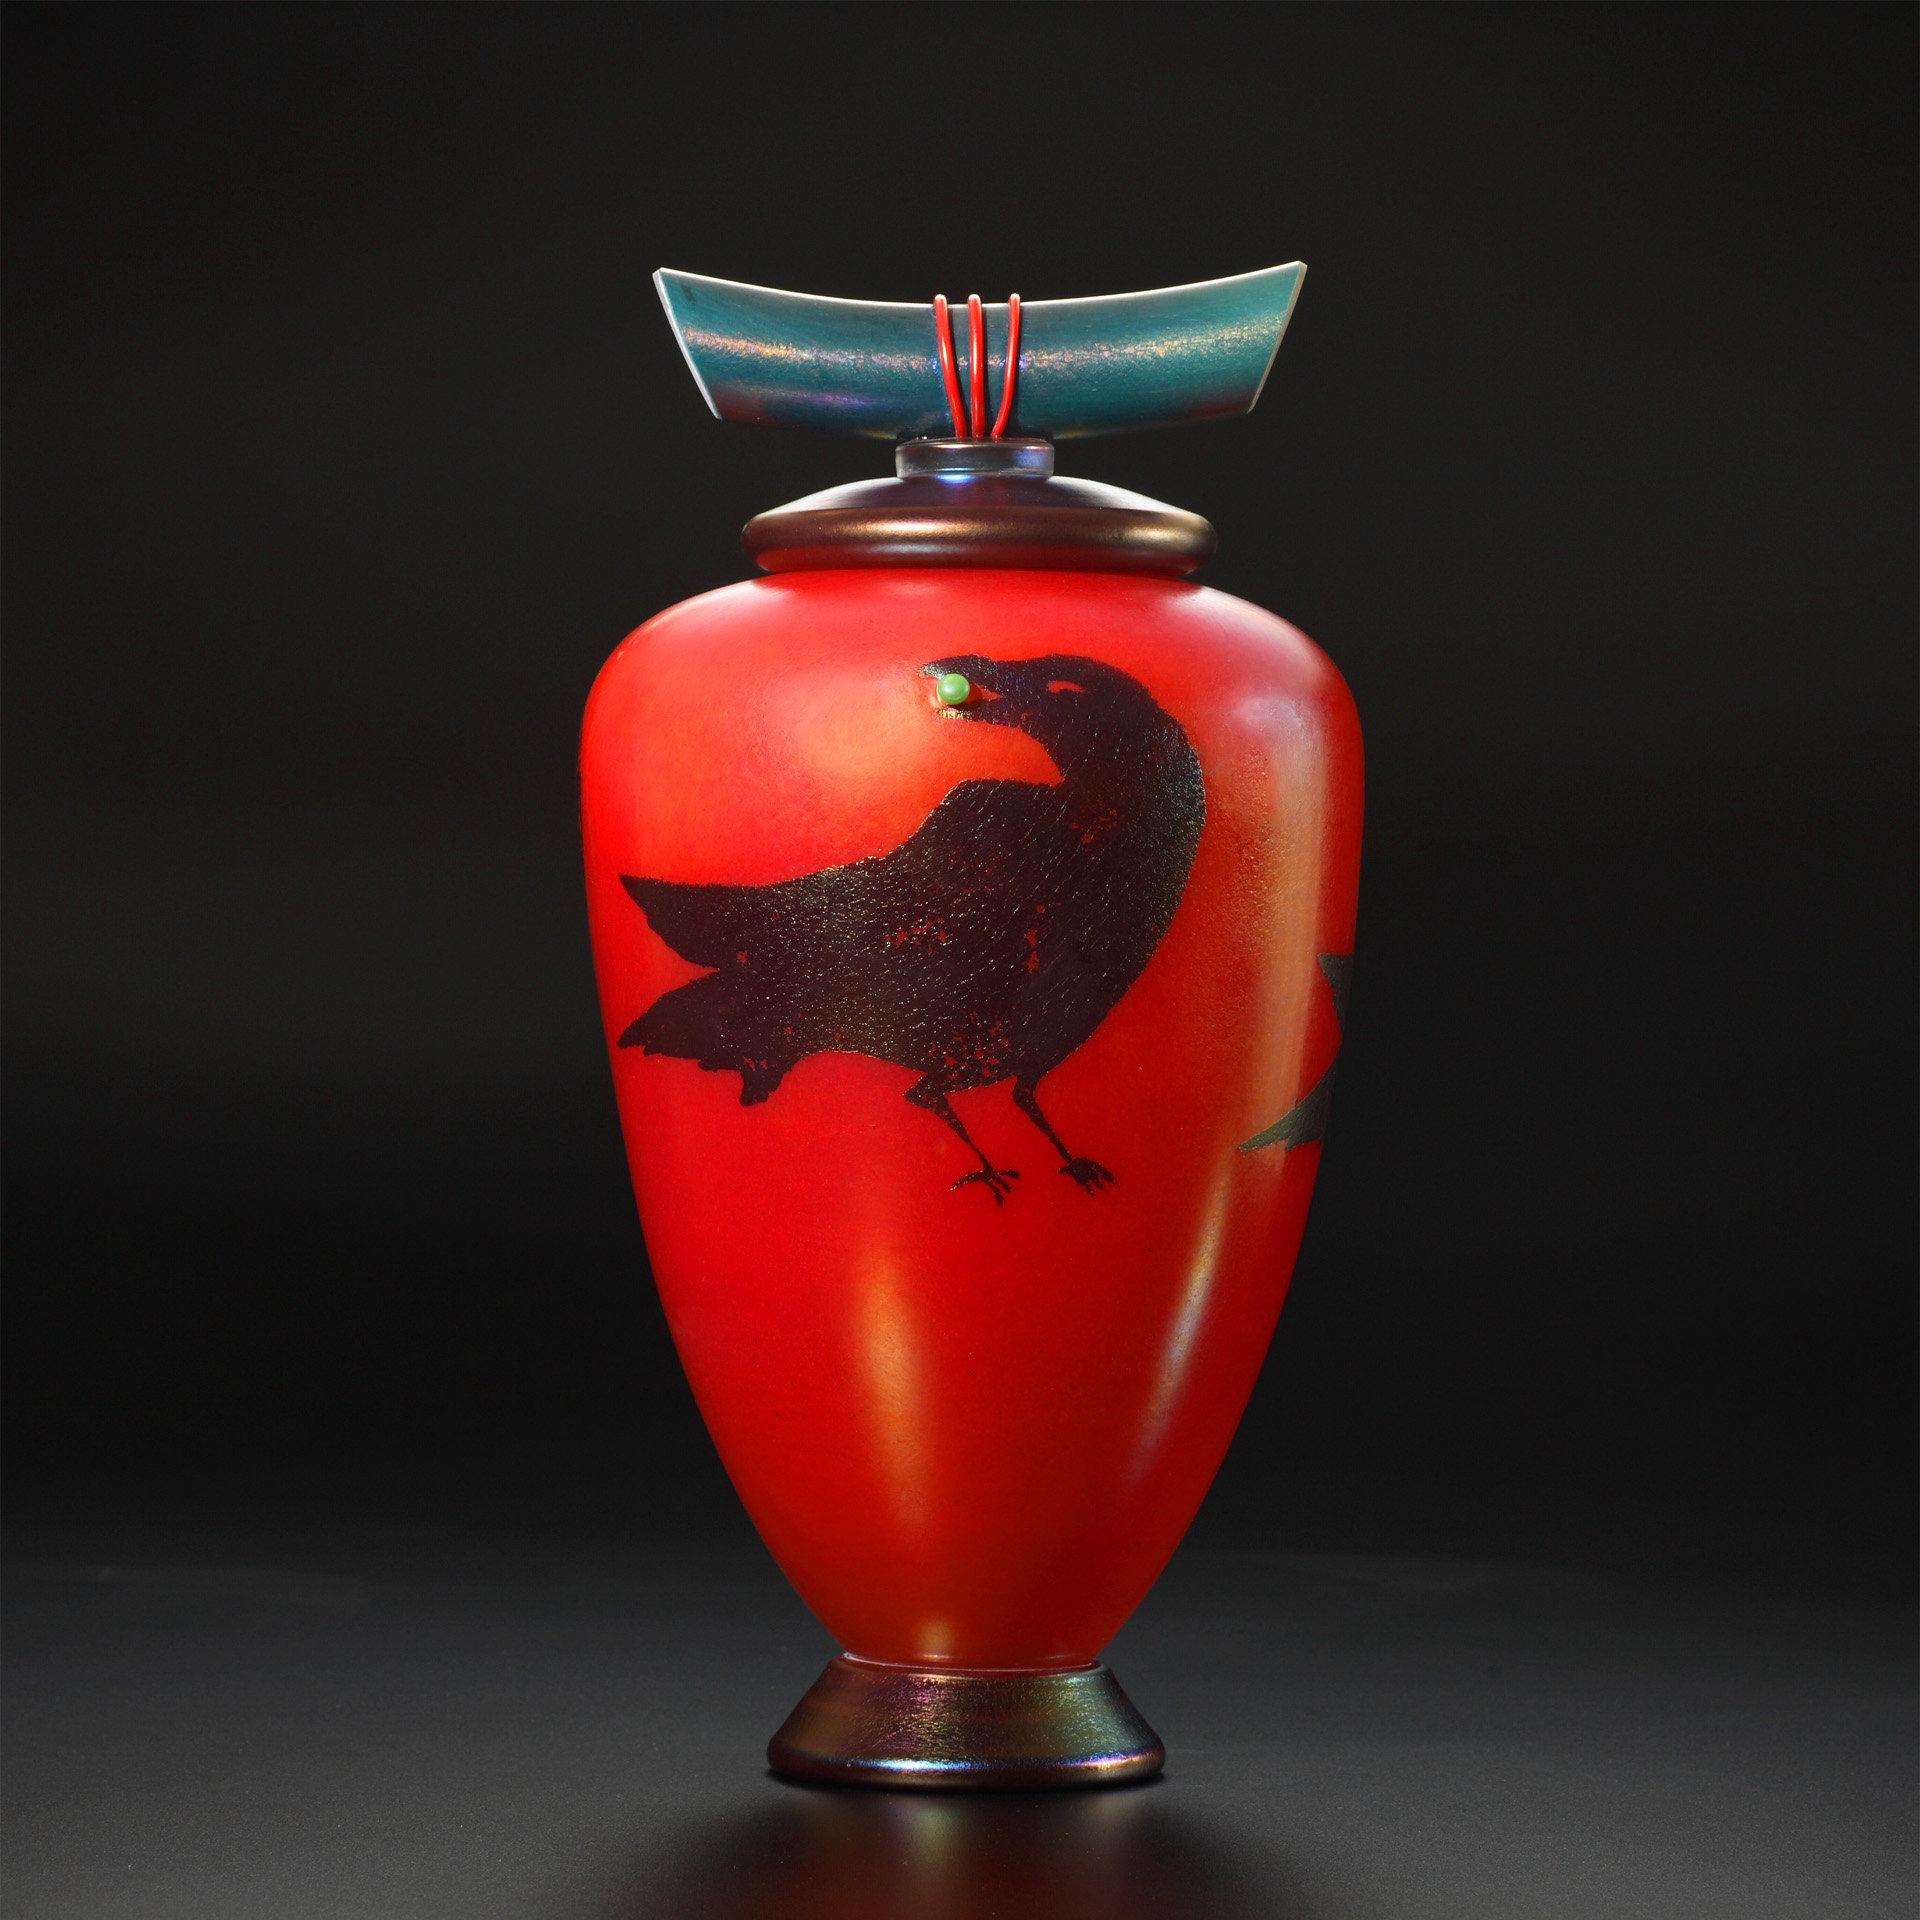 Large Glass Vessel : ... with Berry by John & Heather Fields (Art Glass Vessel) Artful Home